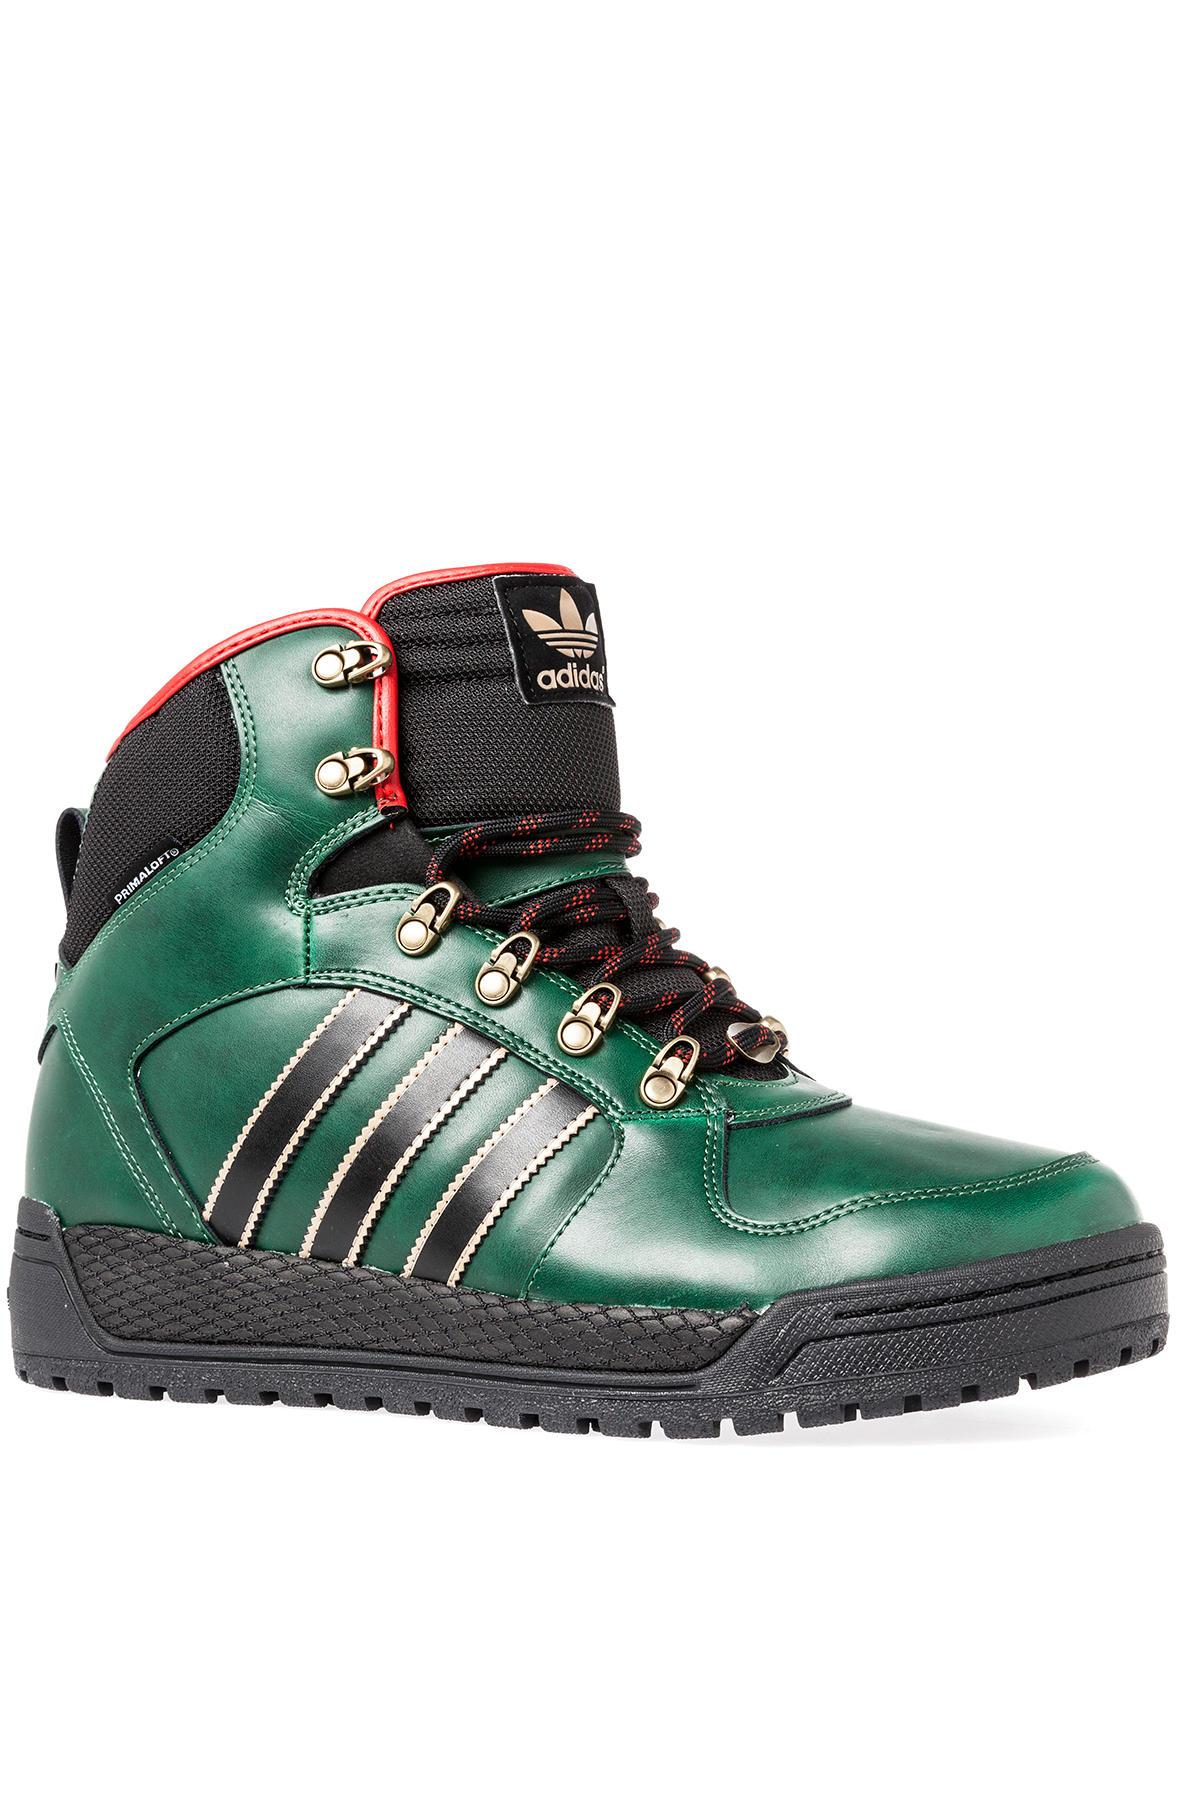 Winter Ball Boot in Green for Men - Lyst